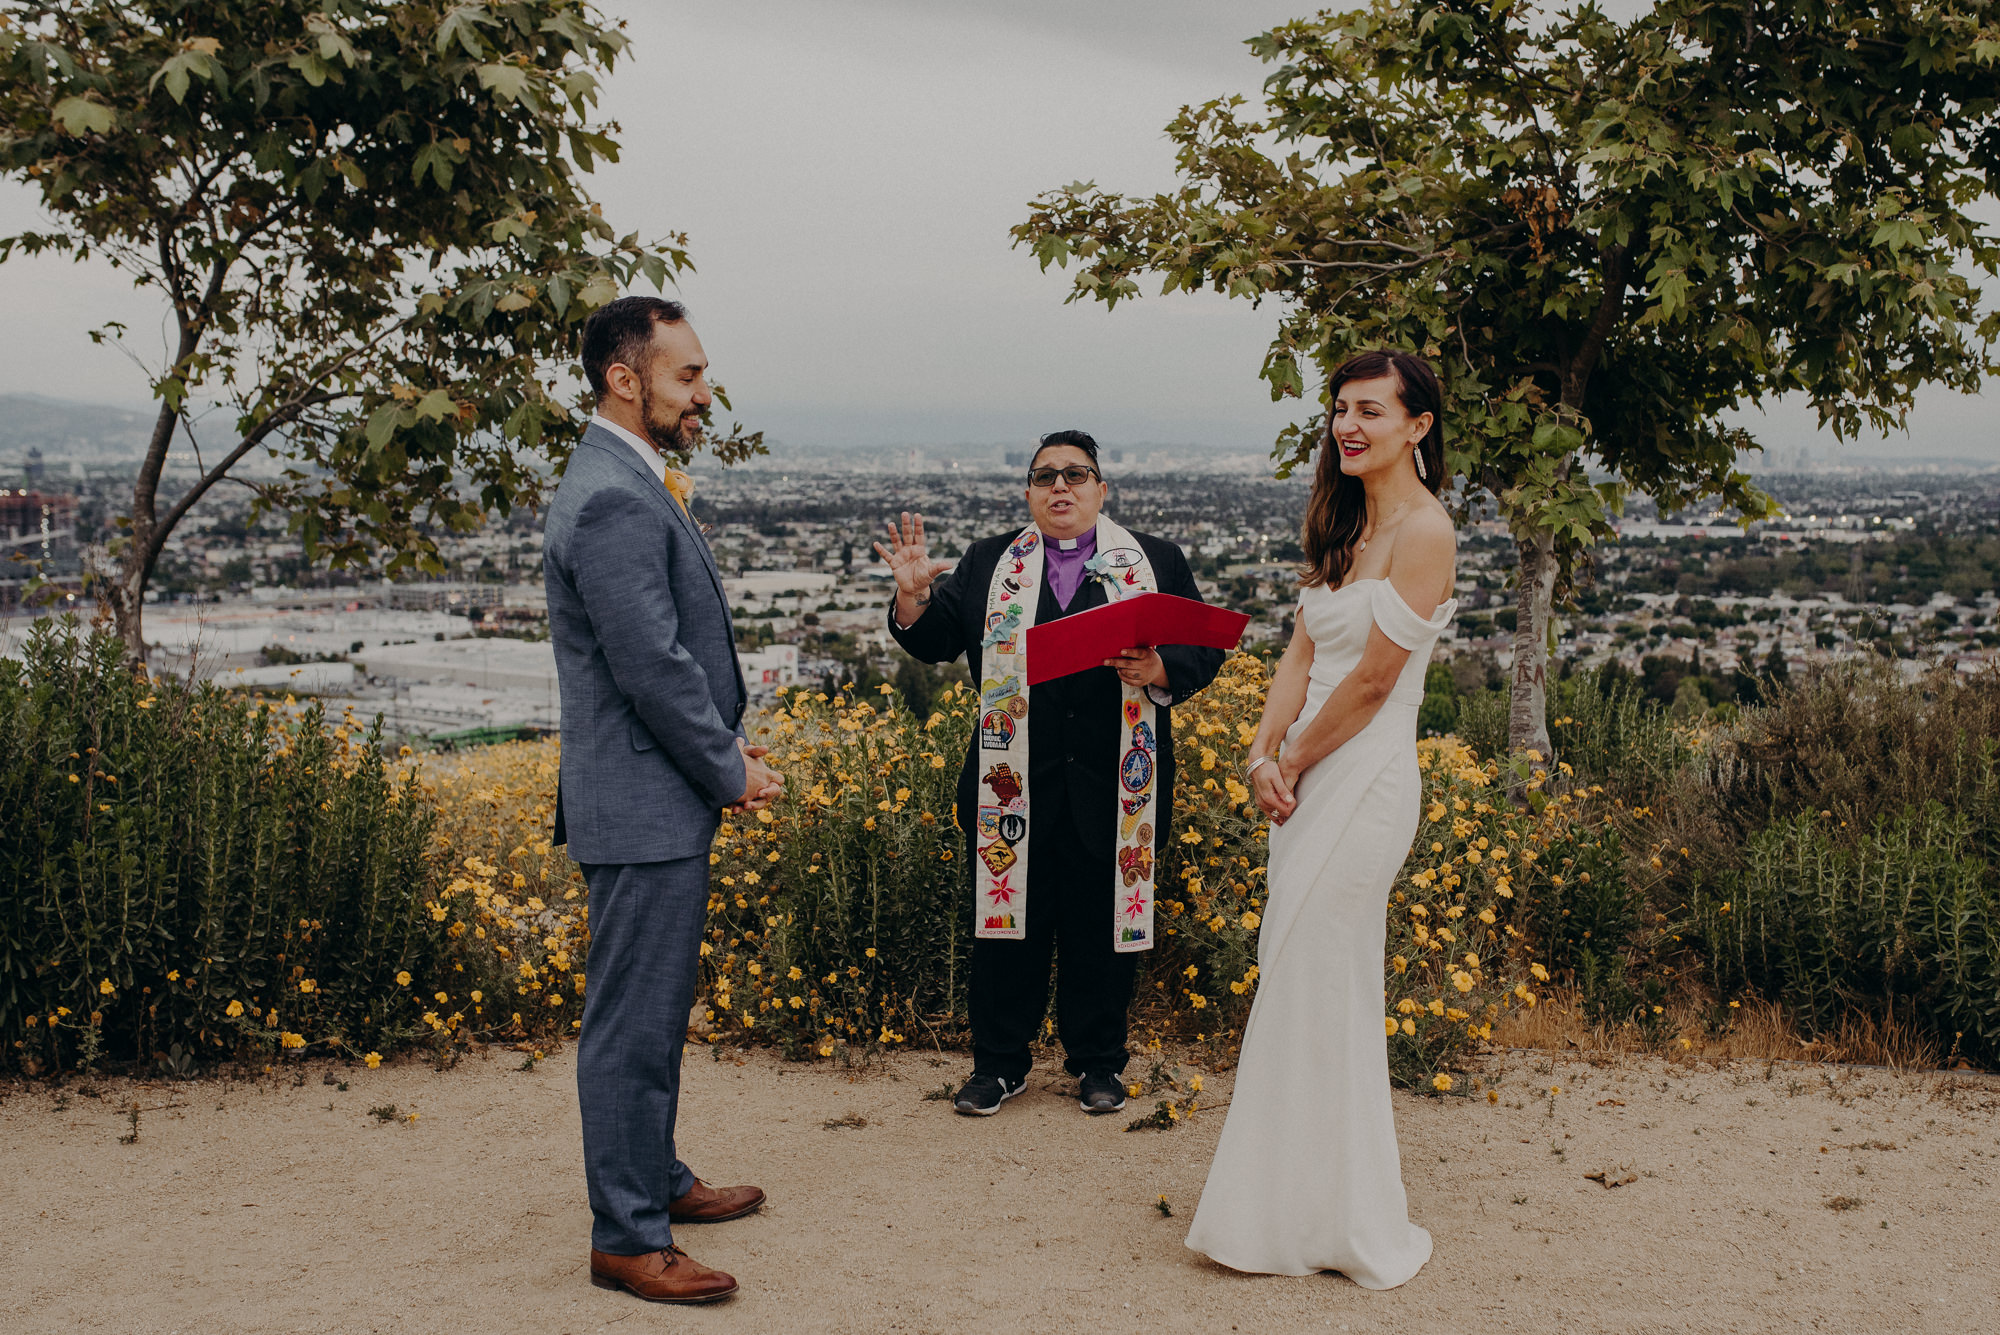 elopement photographer in los angeles - la wedding photographer - isaiahandtaylor.com-060.jpg